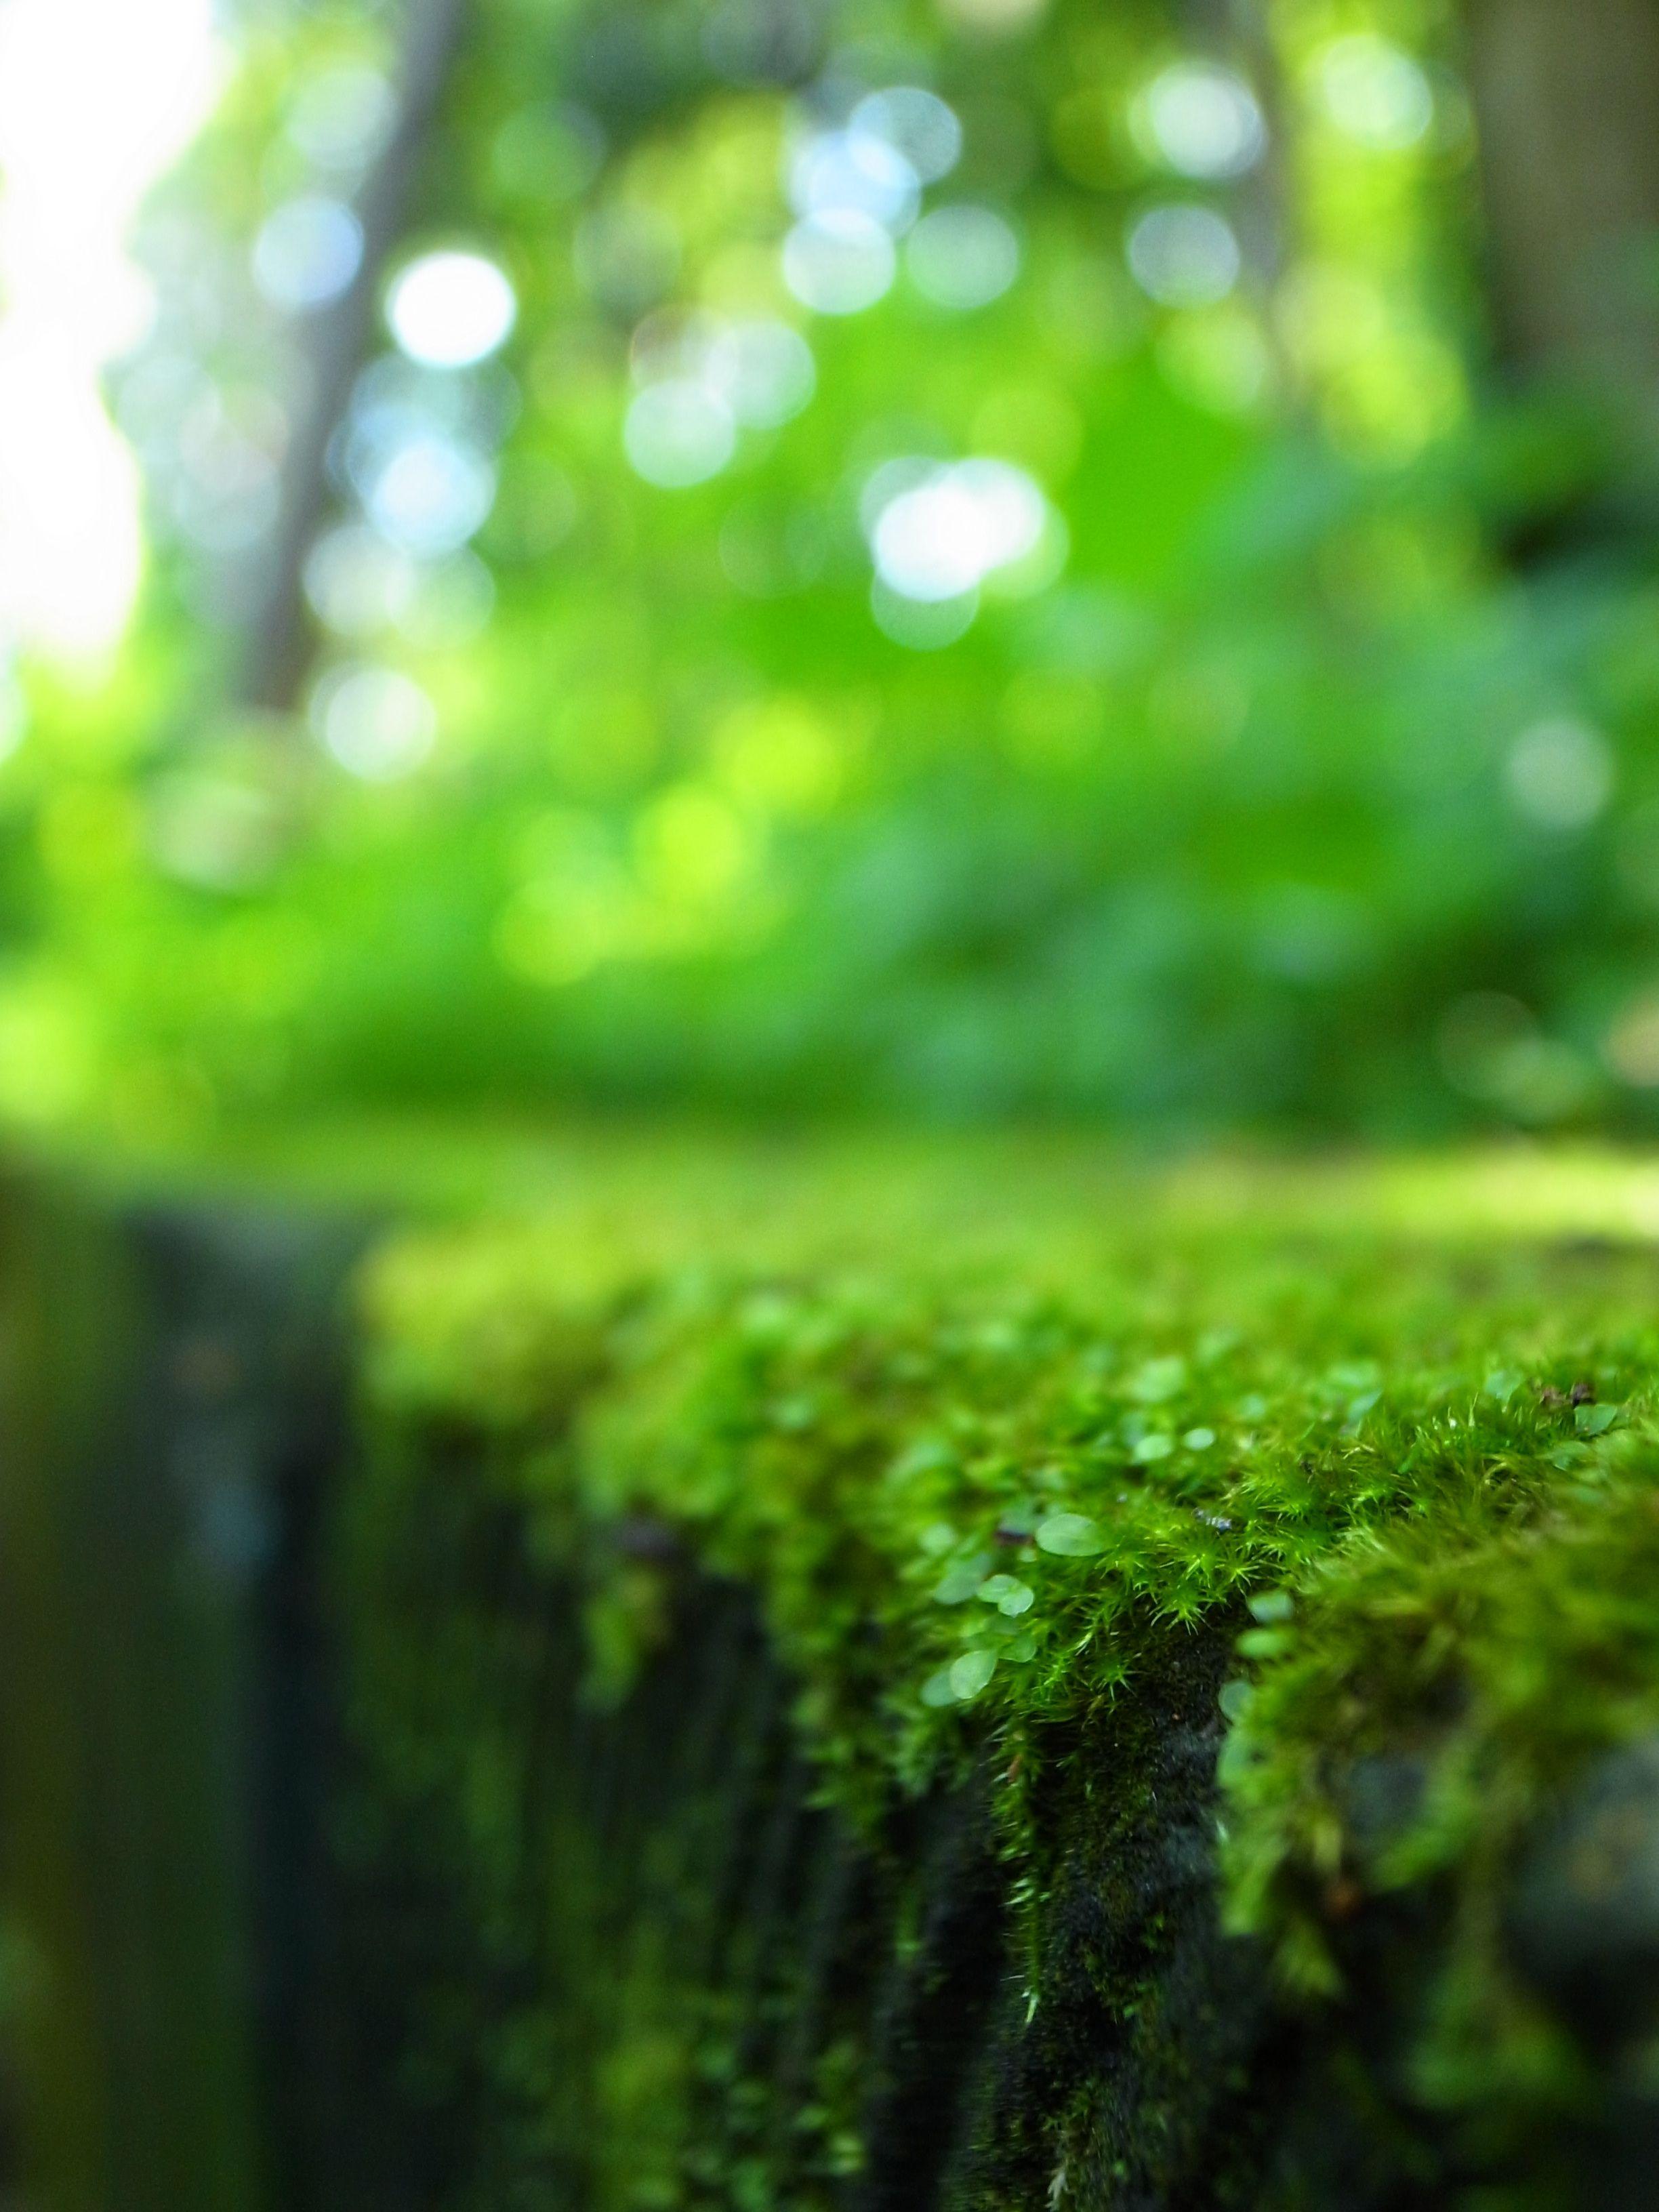 Pin By Usurp On Qiringreen Photoshop Digital Background Photo Background Images Background Images